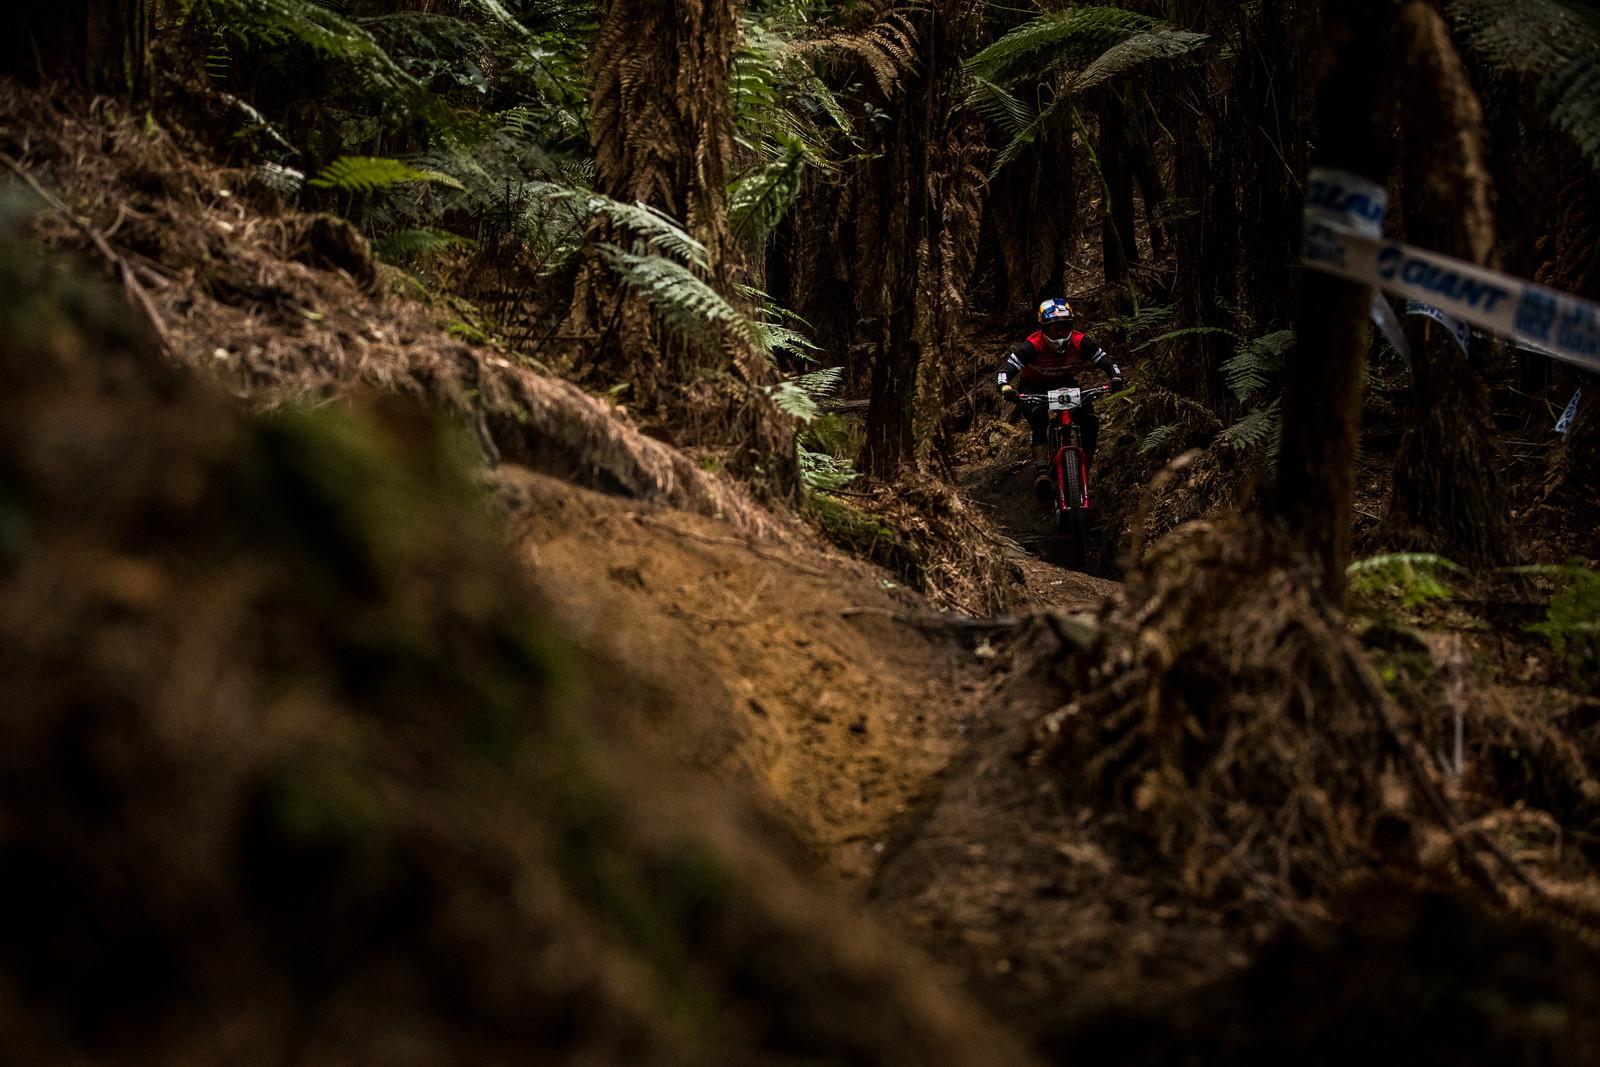 Pedro Burns - 2019 Enduro World Series Crankworx Rotorua - Mountain Biking Pictures - Vital MTB